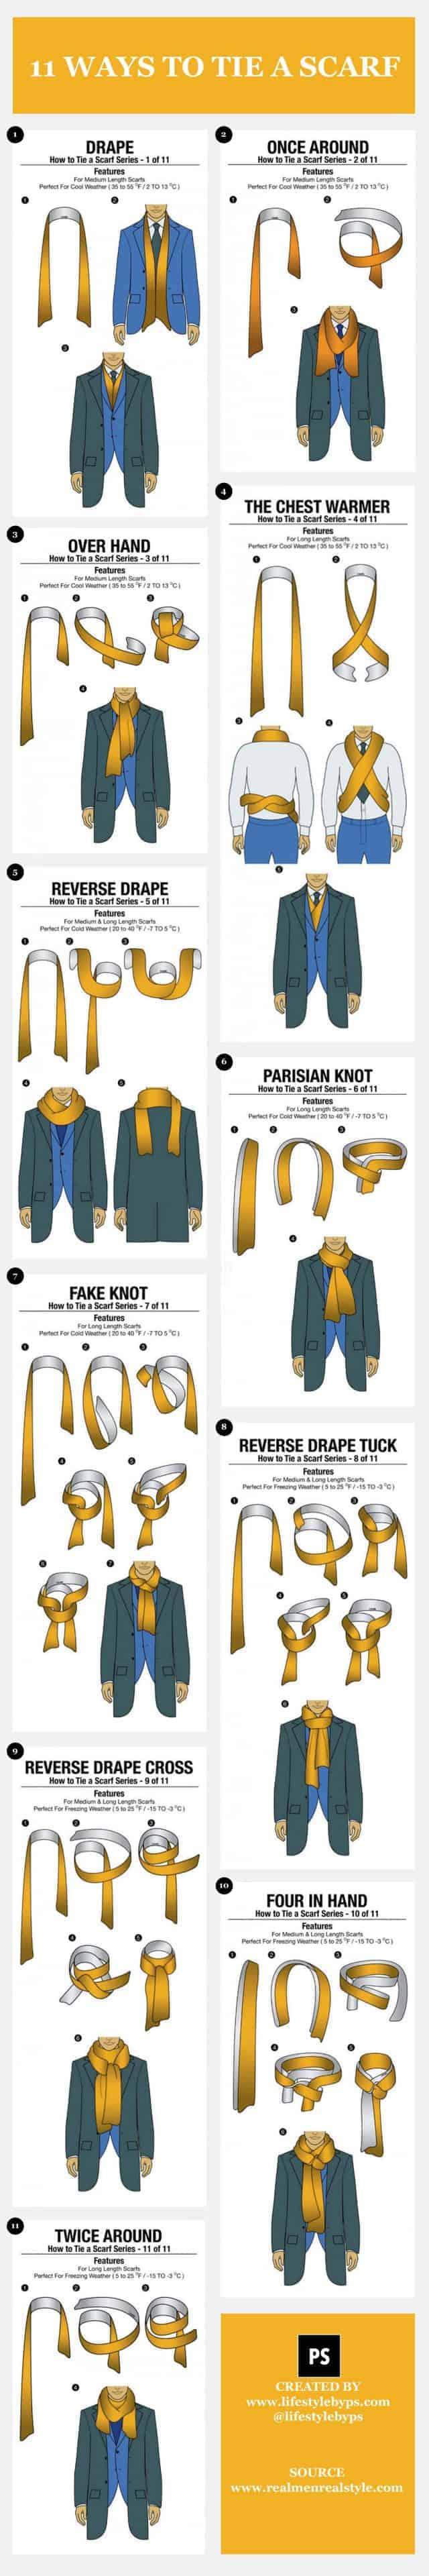 11-simple-ways-to-tie-a-scarf_52c9669e796c4